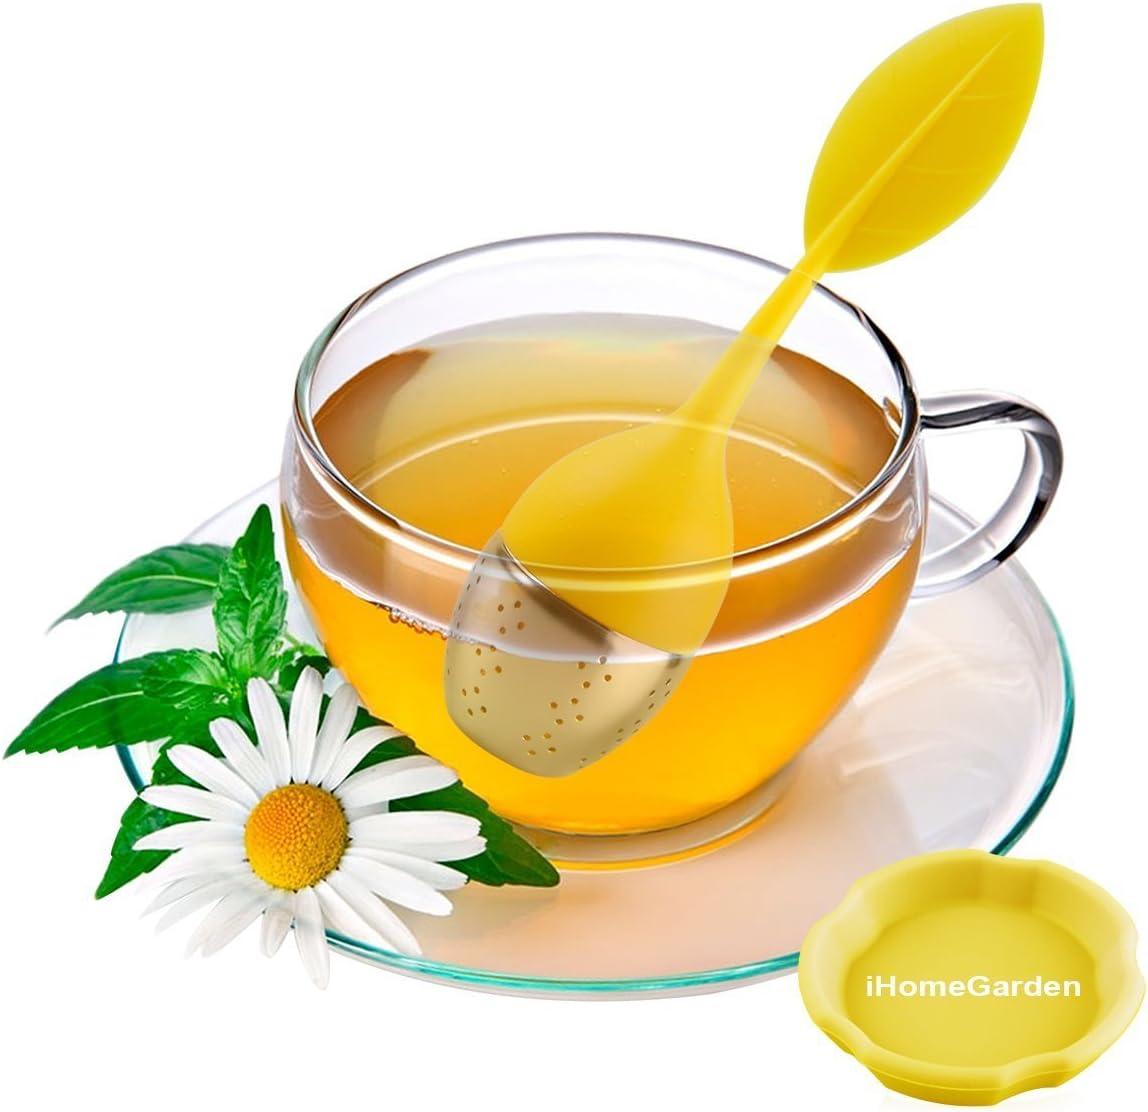 HelpCuisine/® teekugel teesieb teeei teefilter Tea Infuser Set 2 St/ück modernes Blatt Design aus hochwertigem Silikon 100/% BPA frei und rostfreiem Edelstahl 2er Set Gr/ün